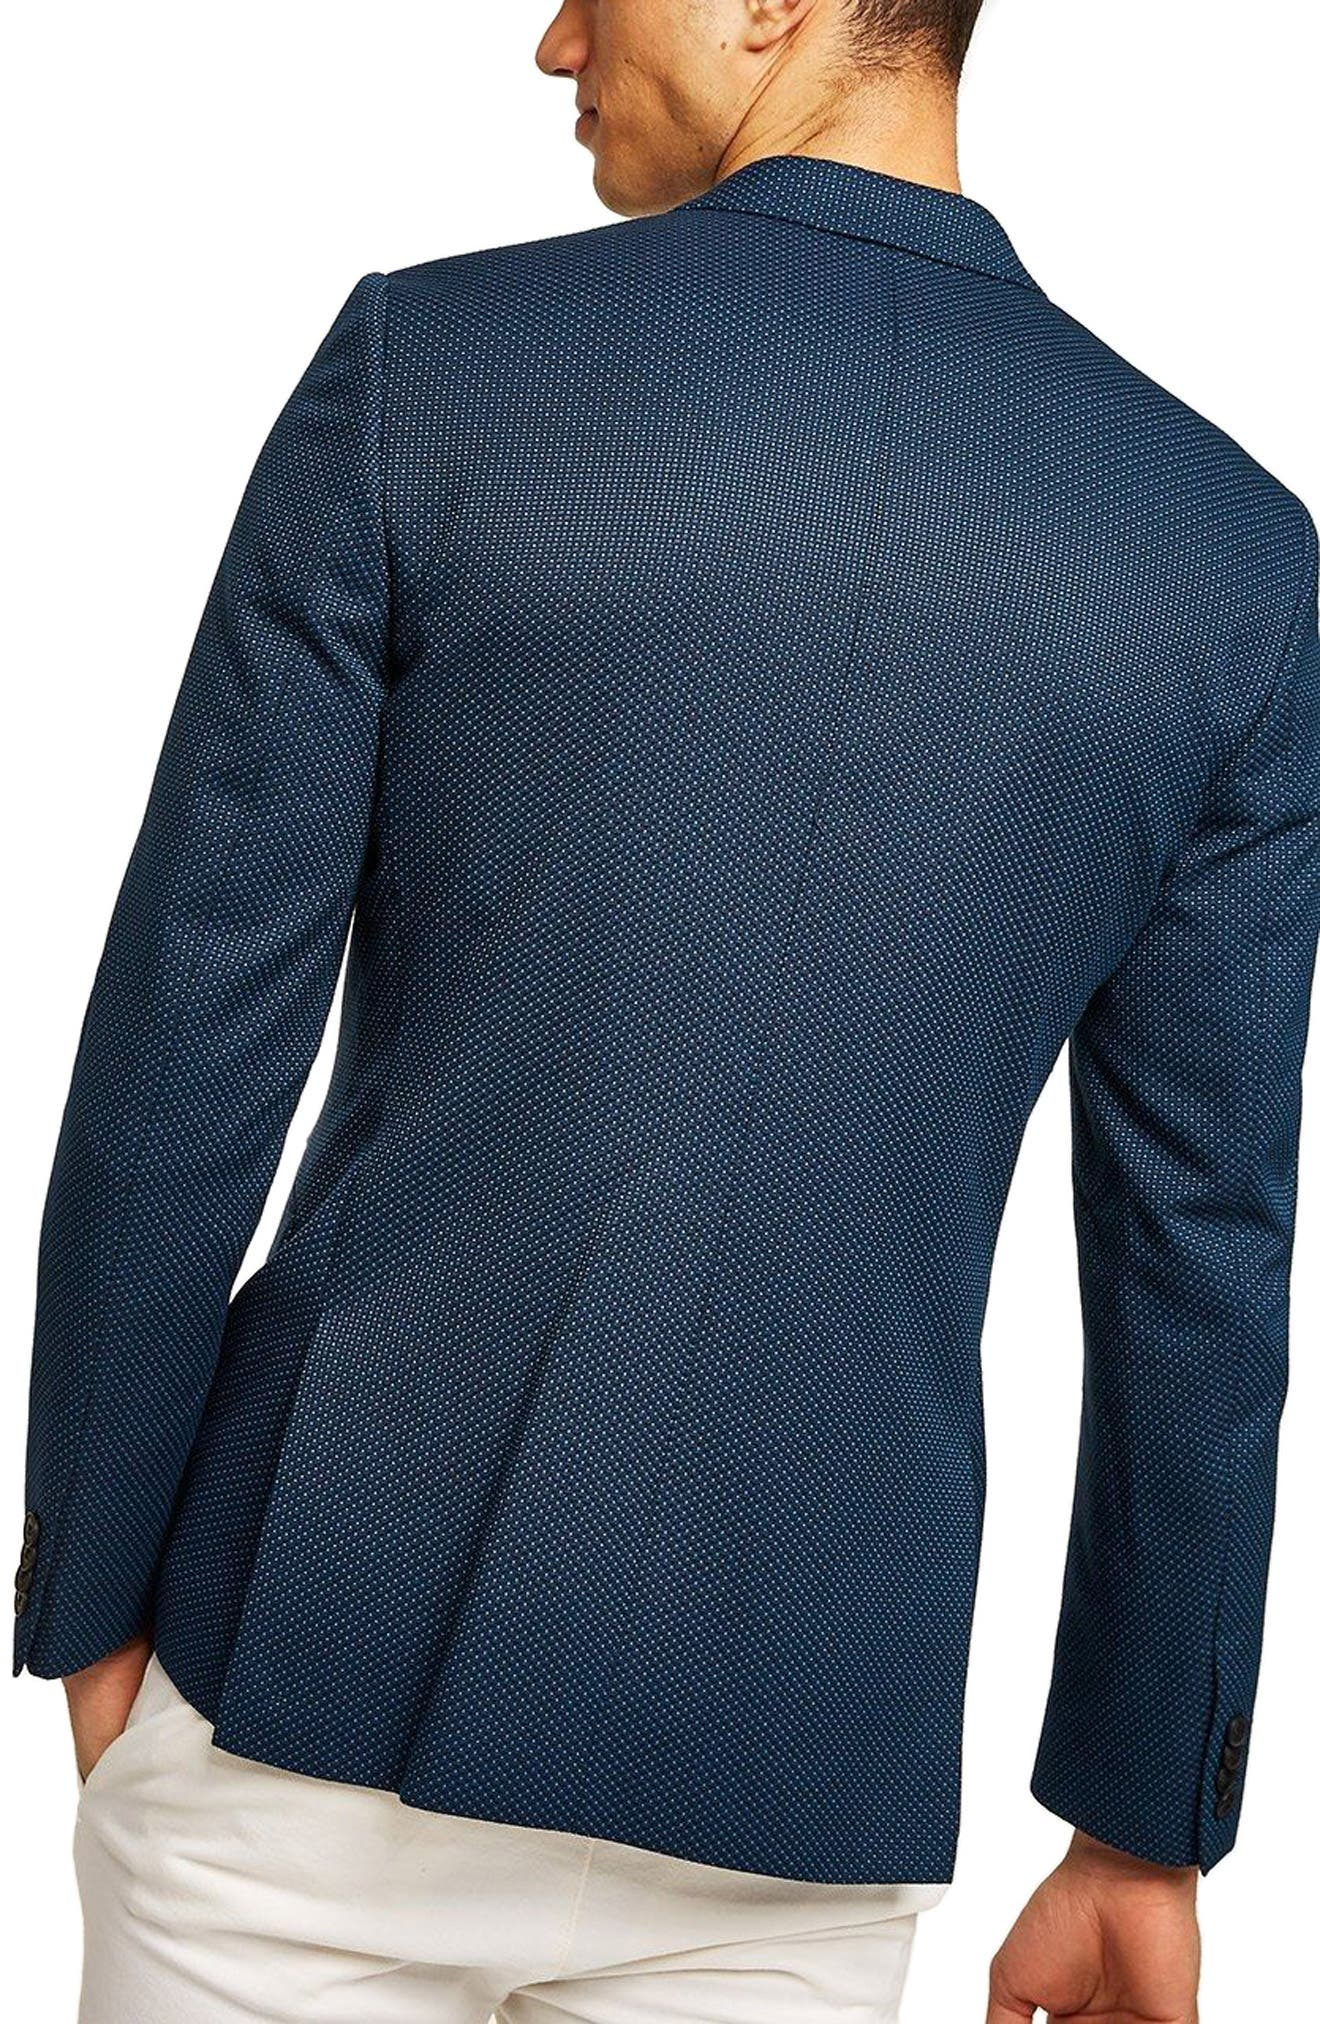 Skinny Fit Pin Dot Suit Jacket,                             Alternate thumbnail 2, color,                             DARK BLUE